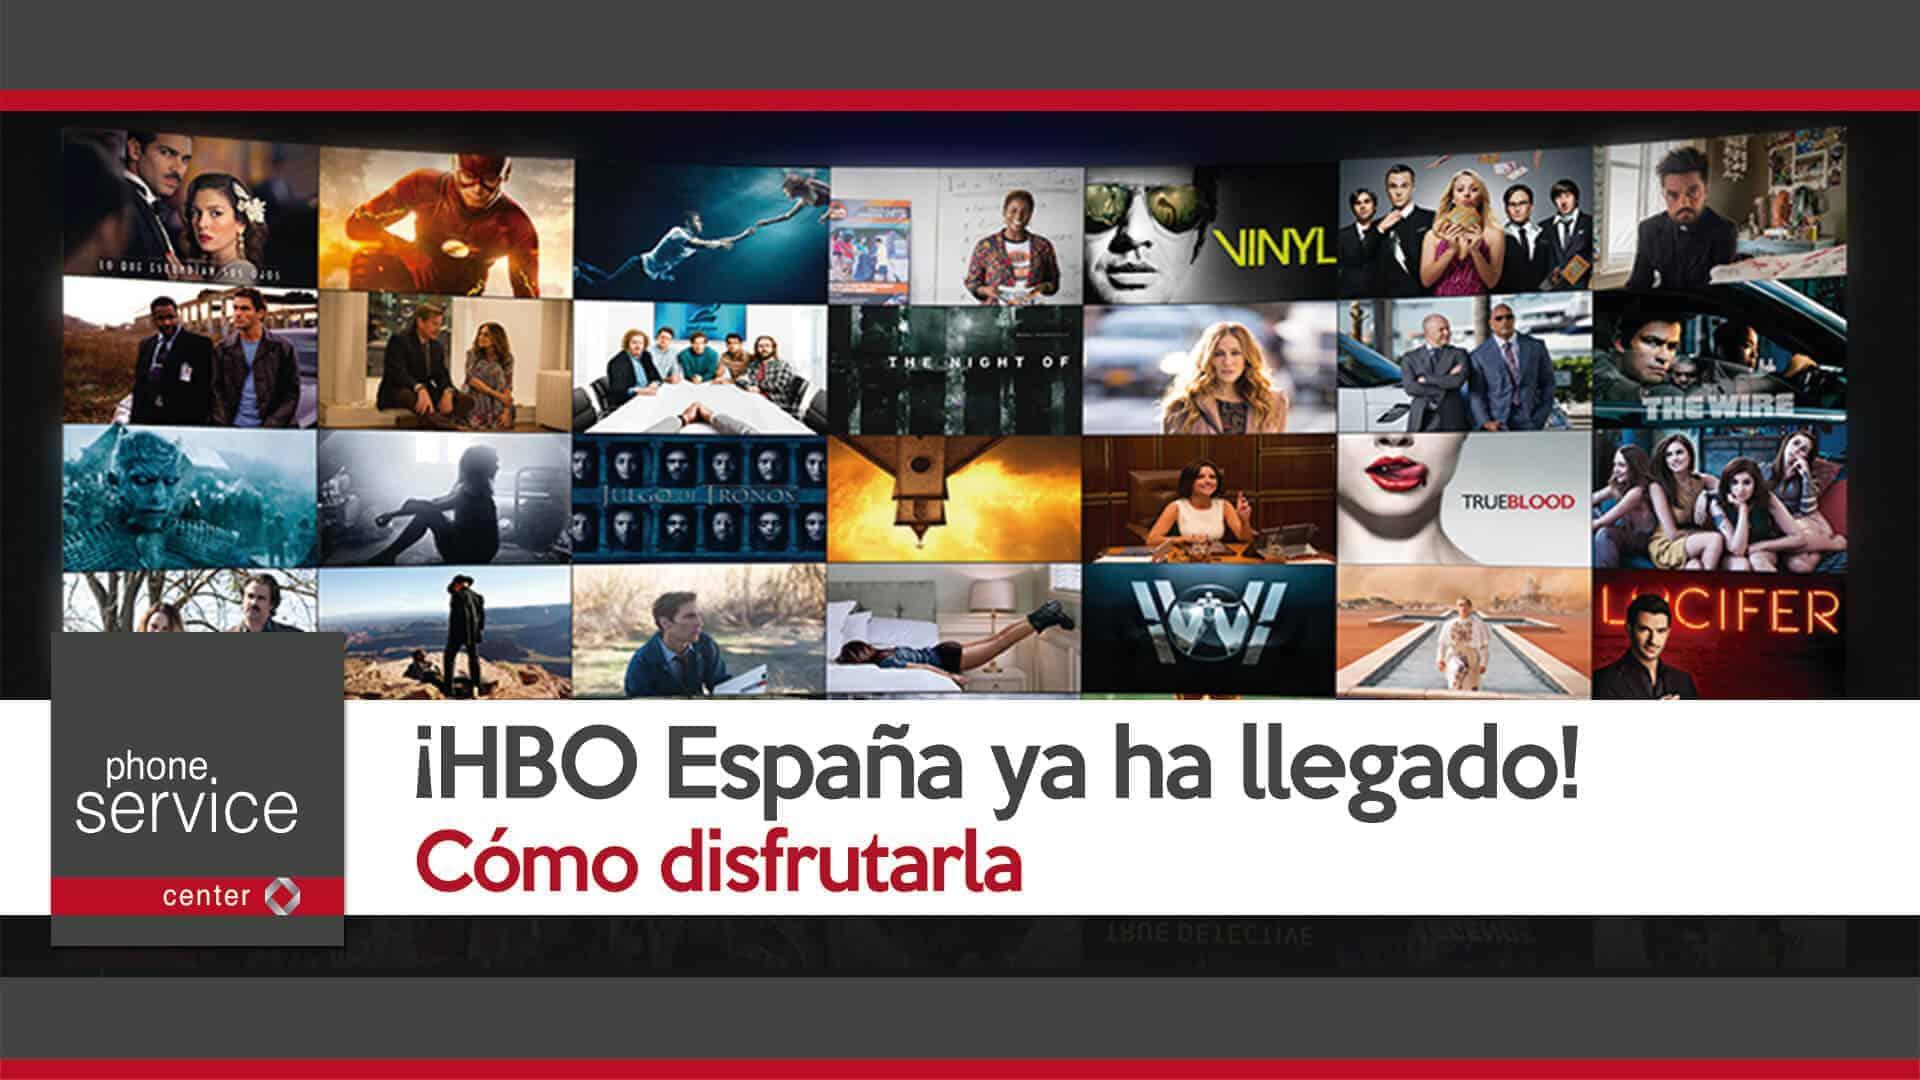 HBO Espana ya ha llegado